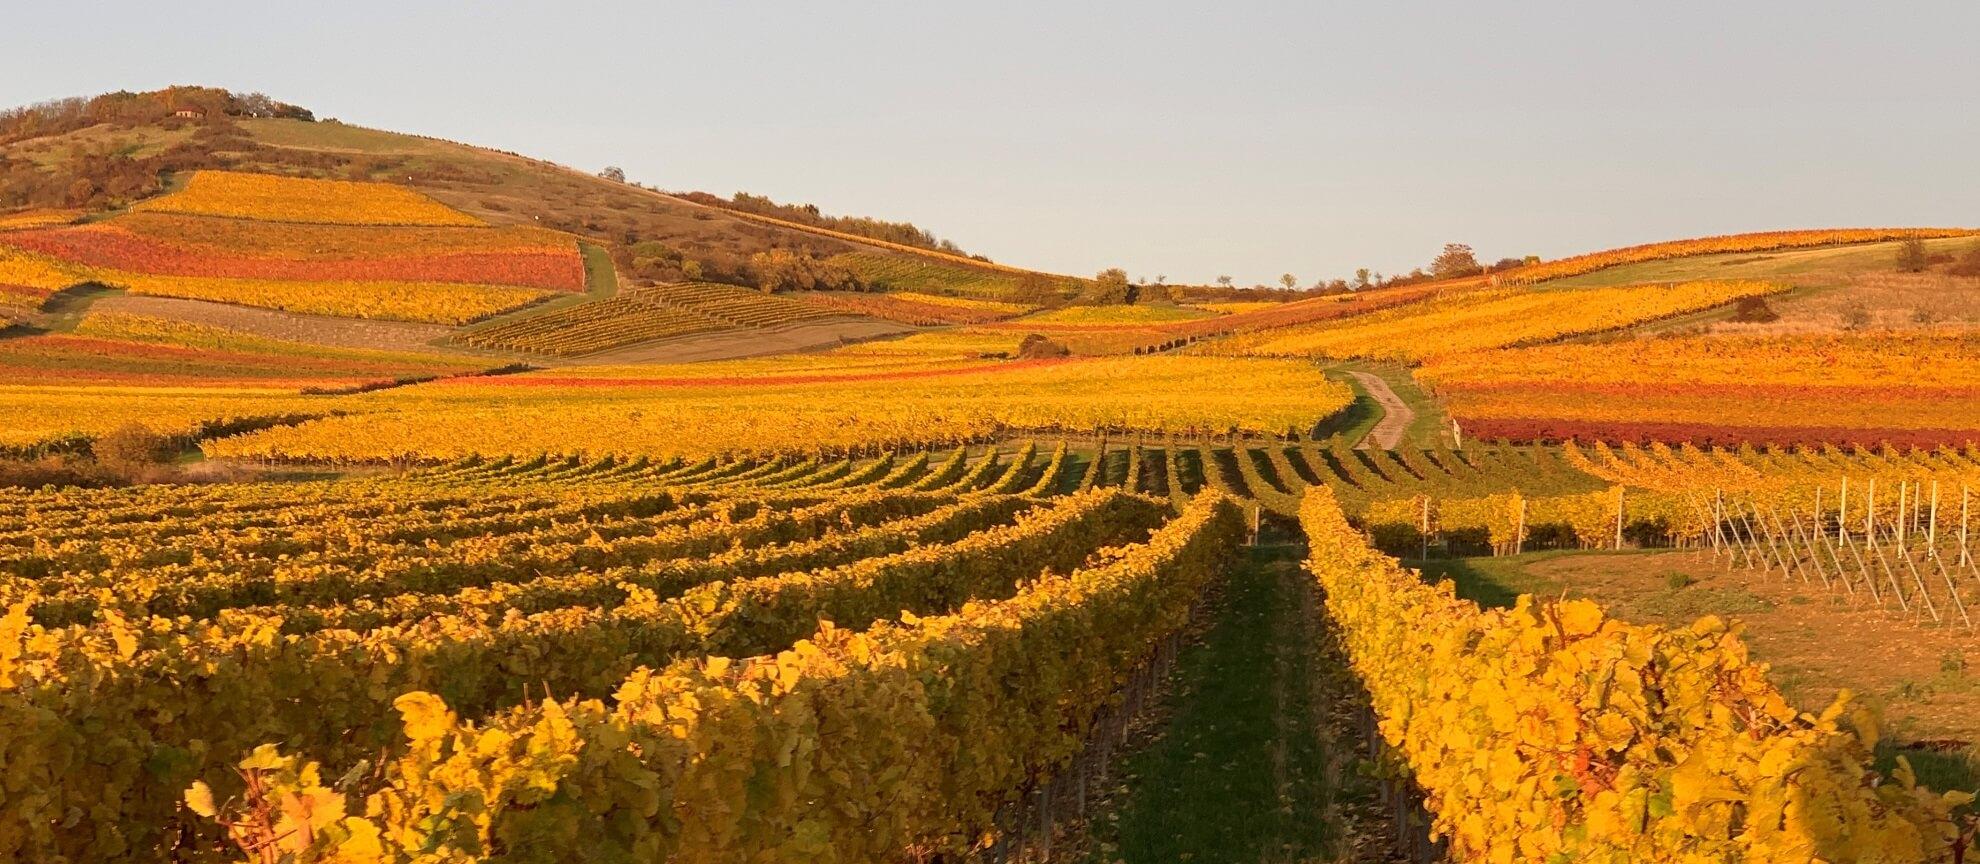 Herbst bei Zotzenheim